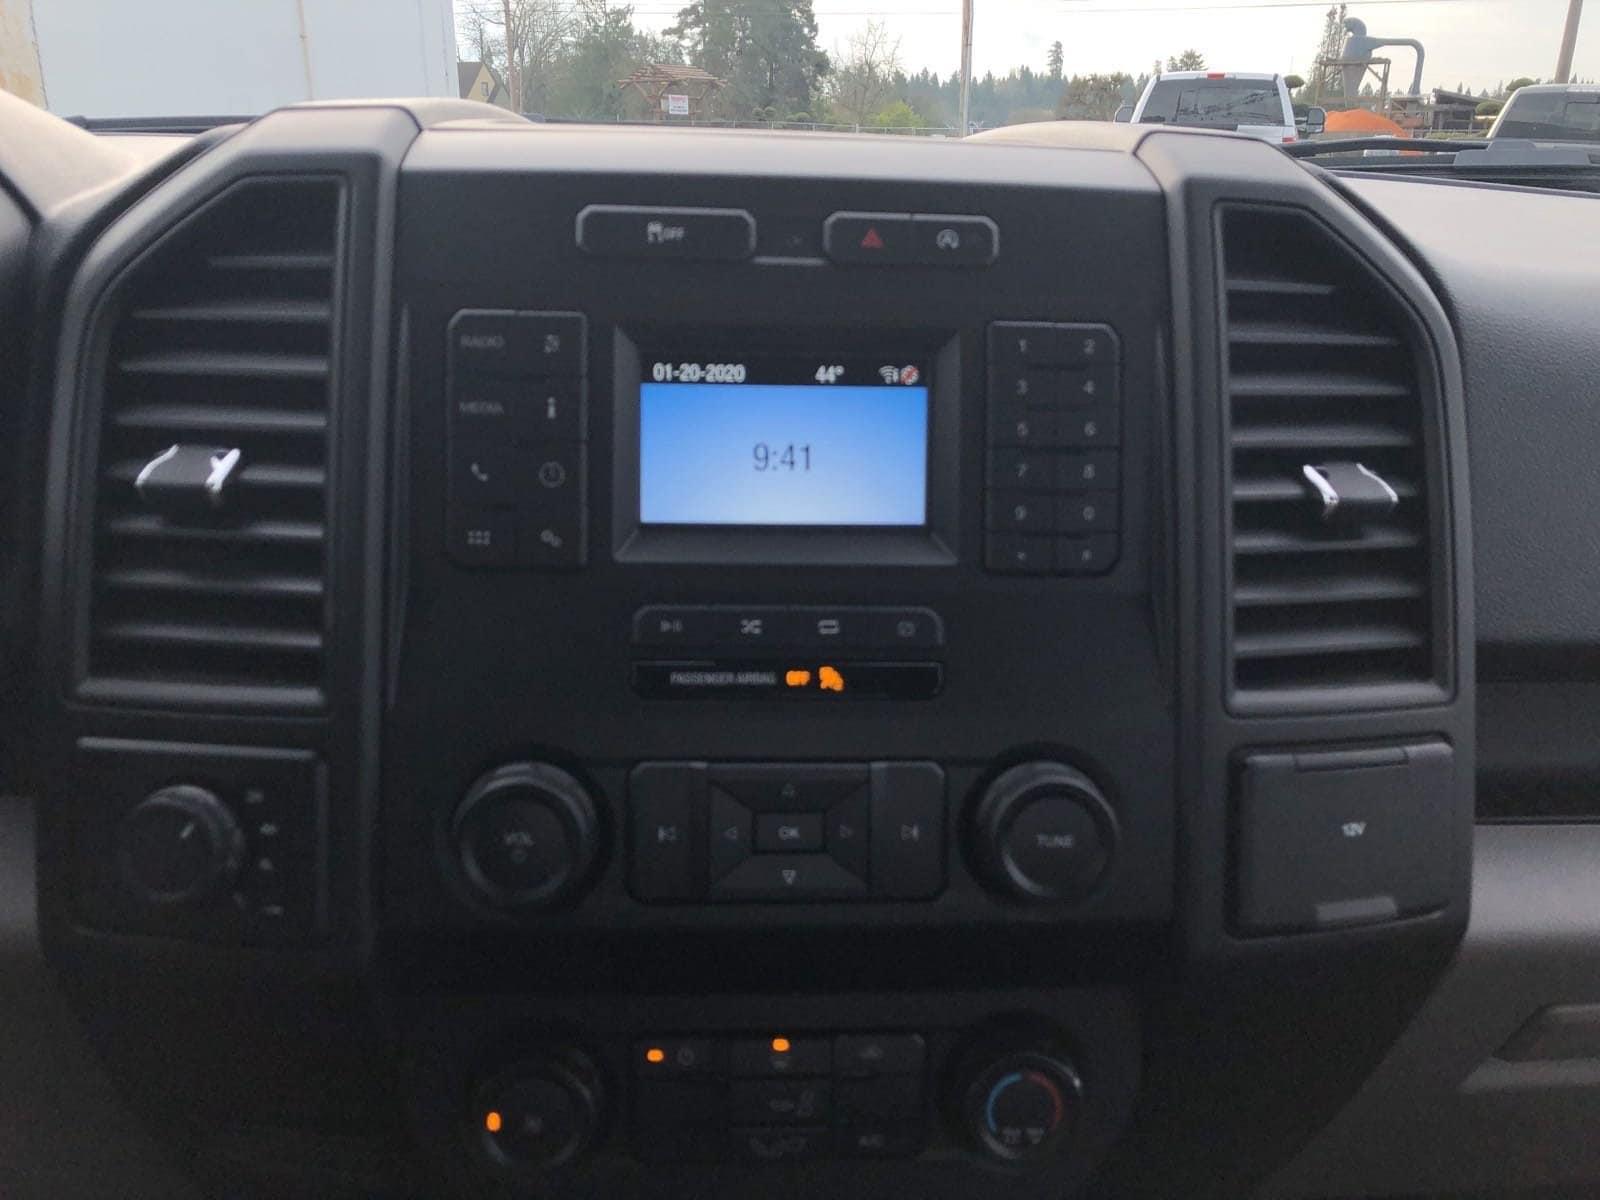 2020 F-150 Super Cab 4x4, Pickup #209331 - photo 1